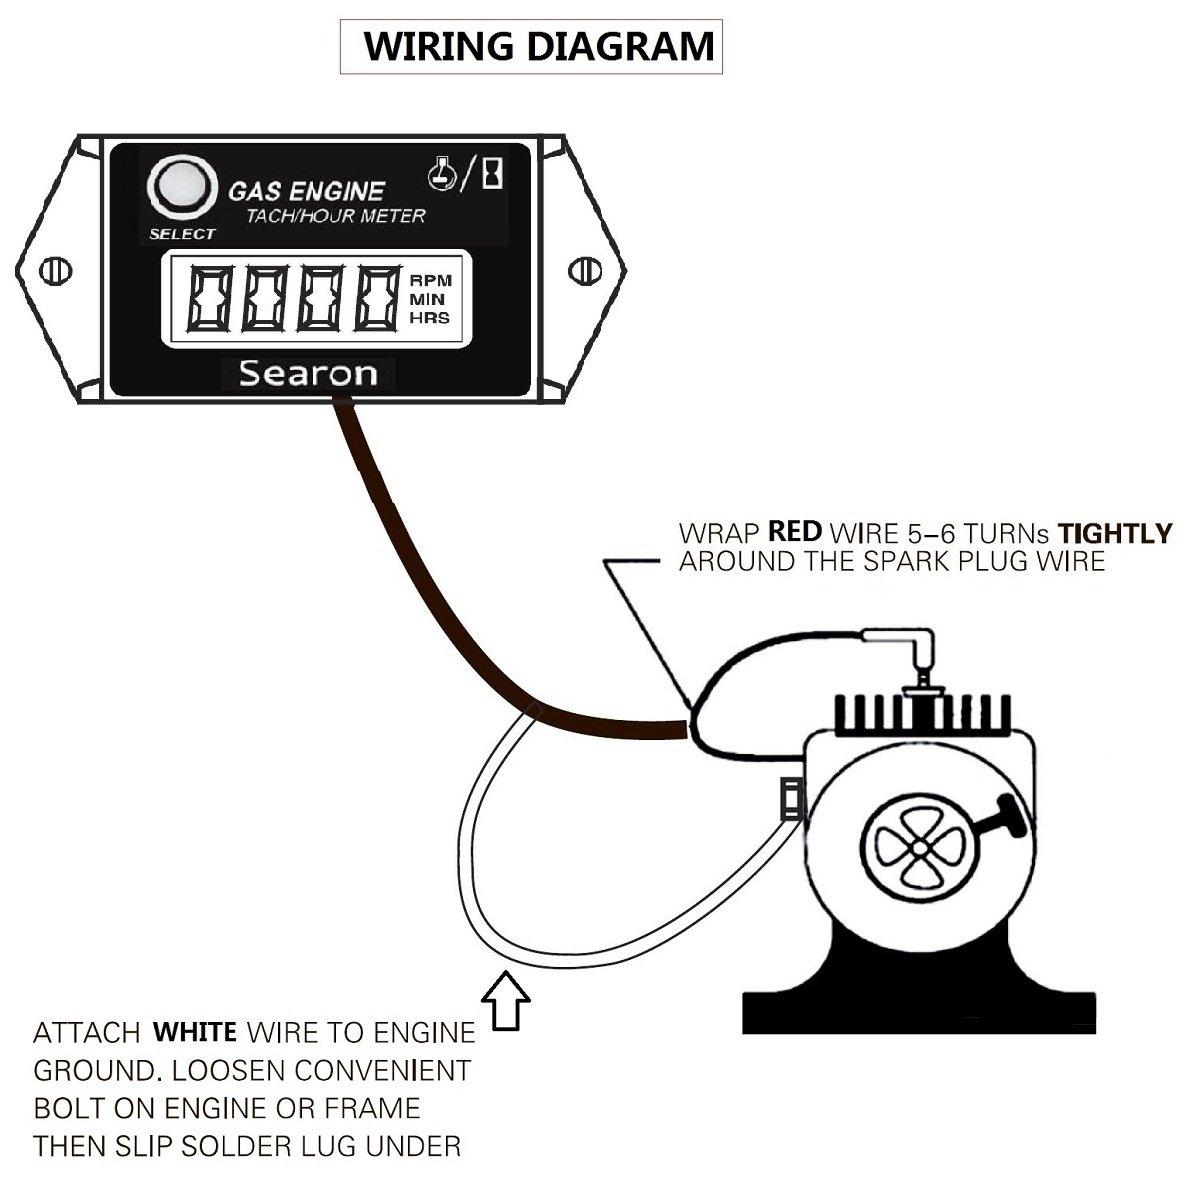 Searon Digital Hour Tachometer Rpm Counter For Snowmobile Skis Motor Dragon Tach Wiring Diagram Bike Go Kart Lawn Mower Wzxhm Srt 26 Categories Patio Garden Tibs